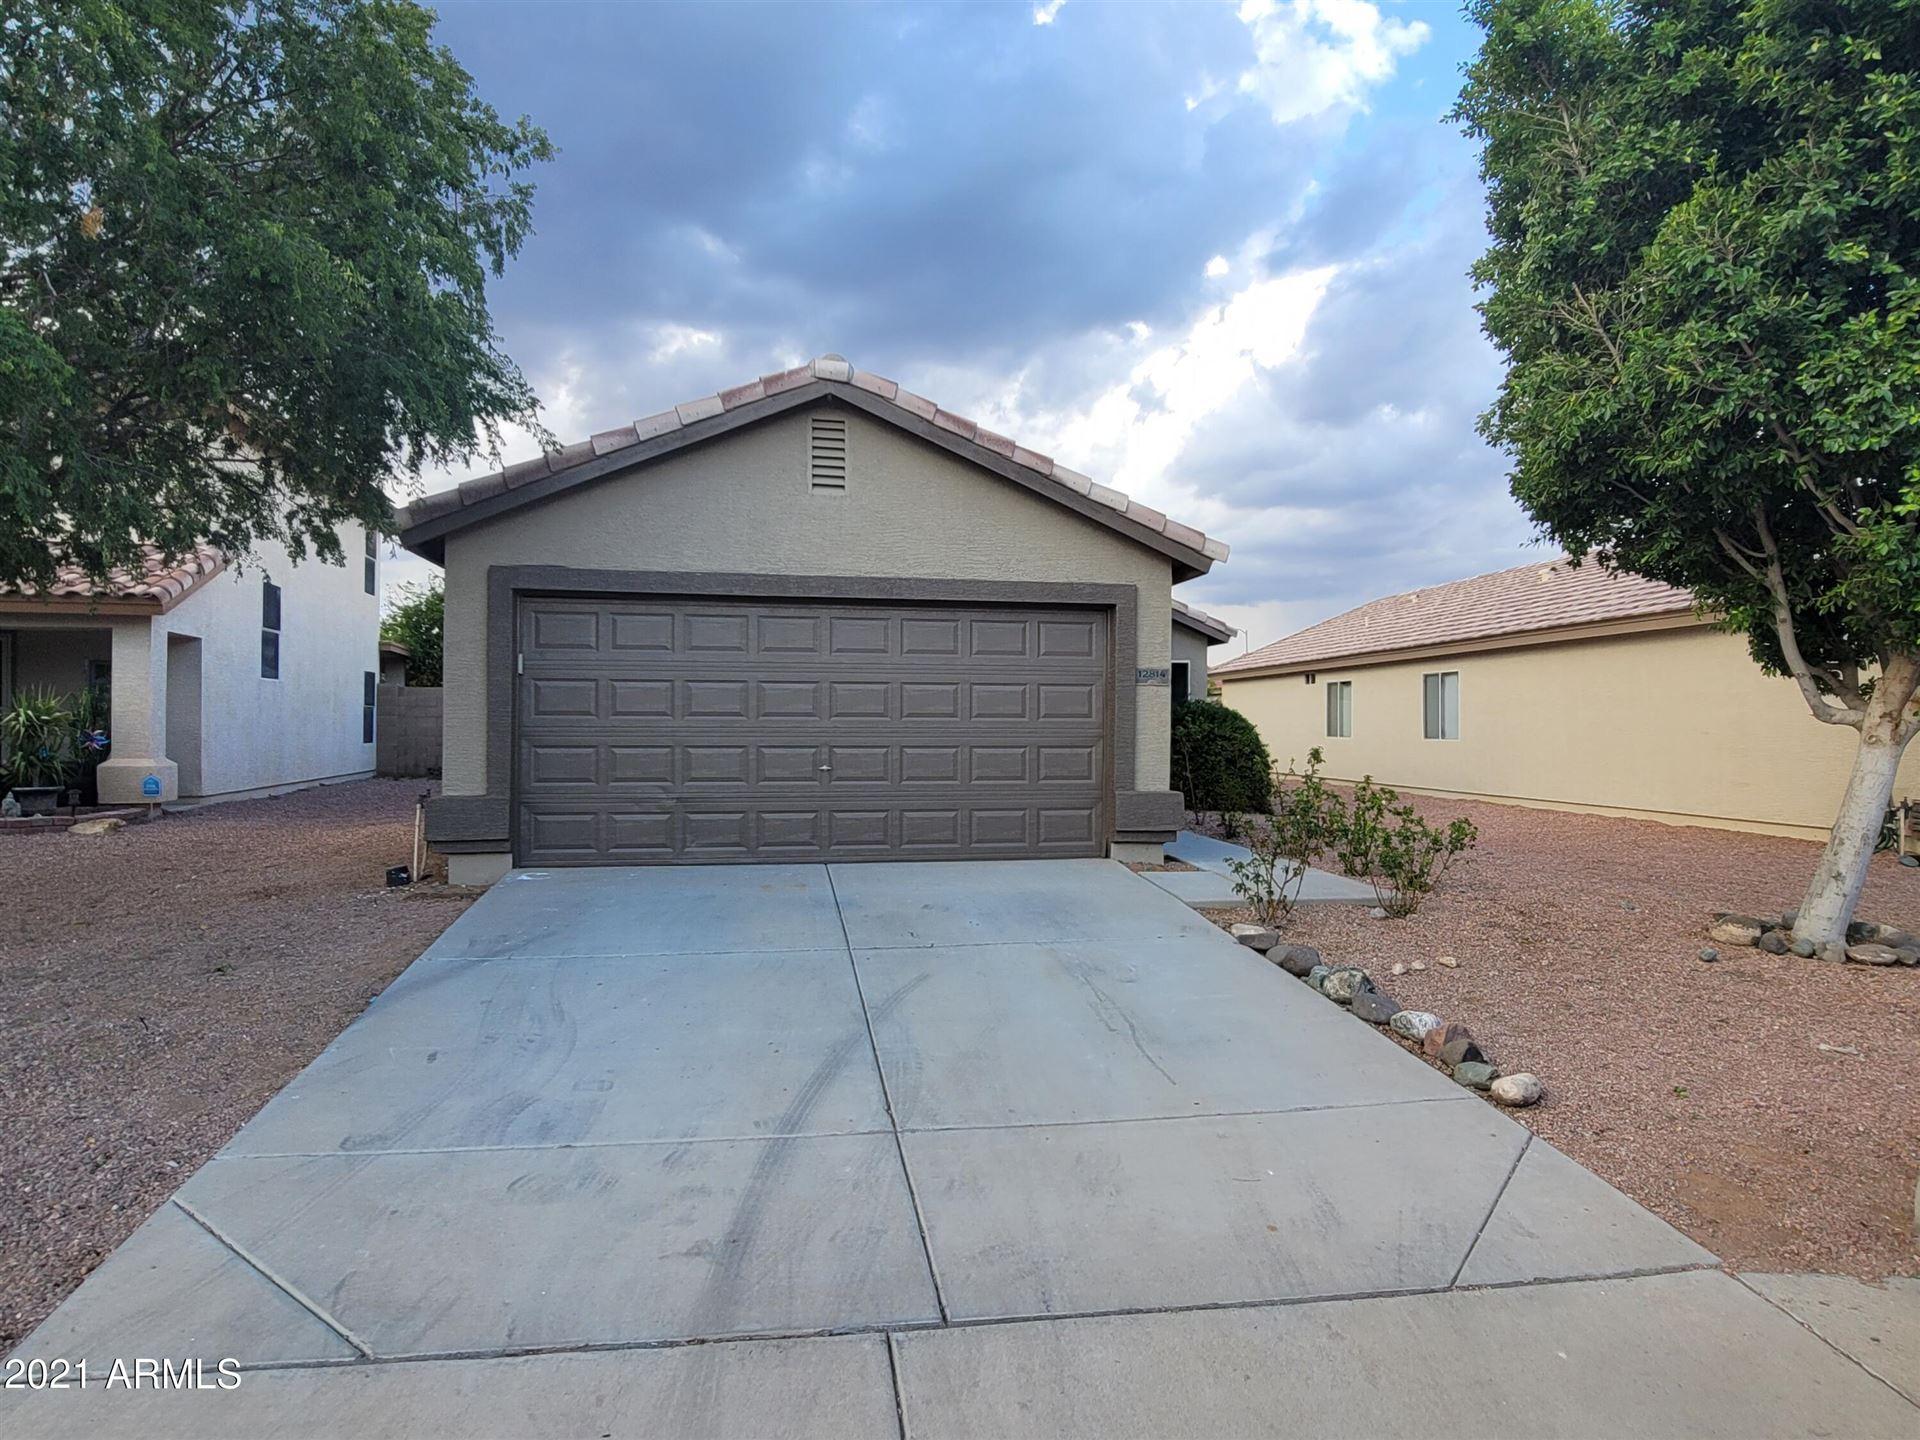 Photo of 12814 W CHERRY HILLS Drive, El Mirage, AZ 85335 (MLS # 6291680)